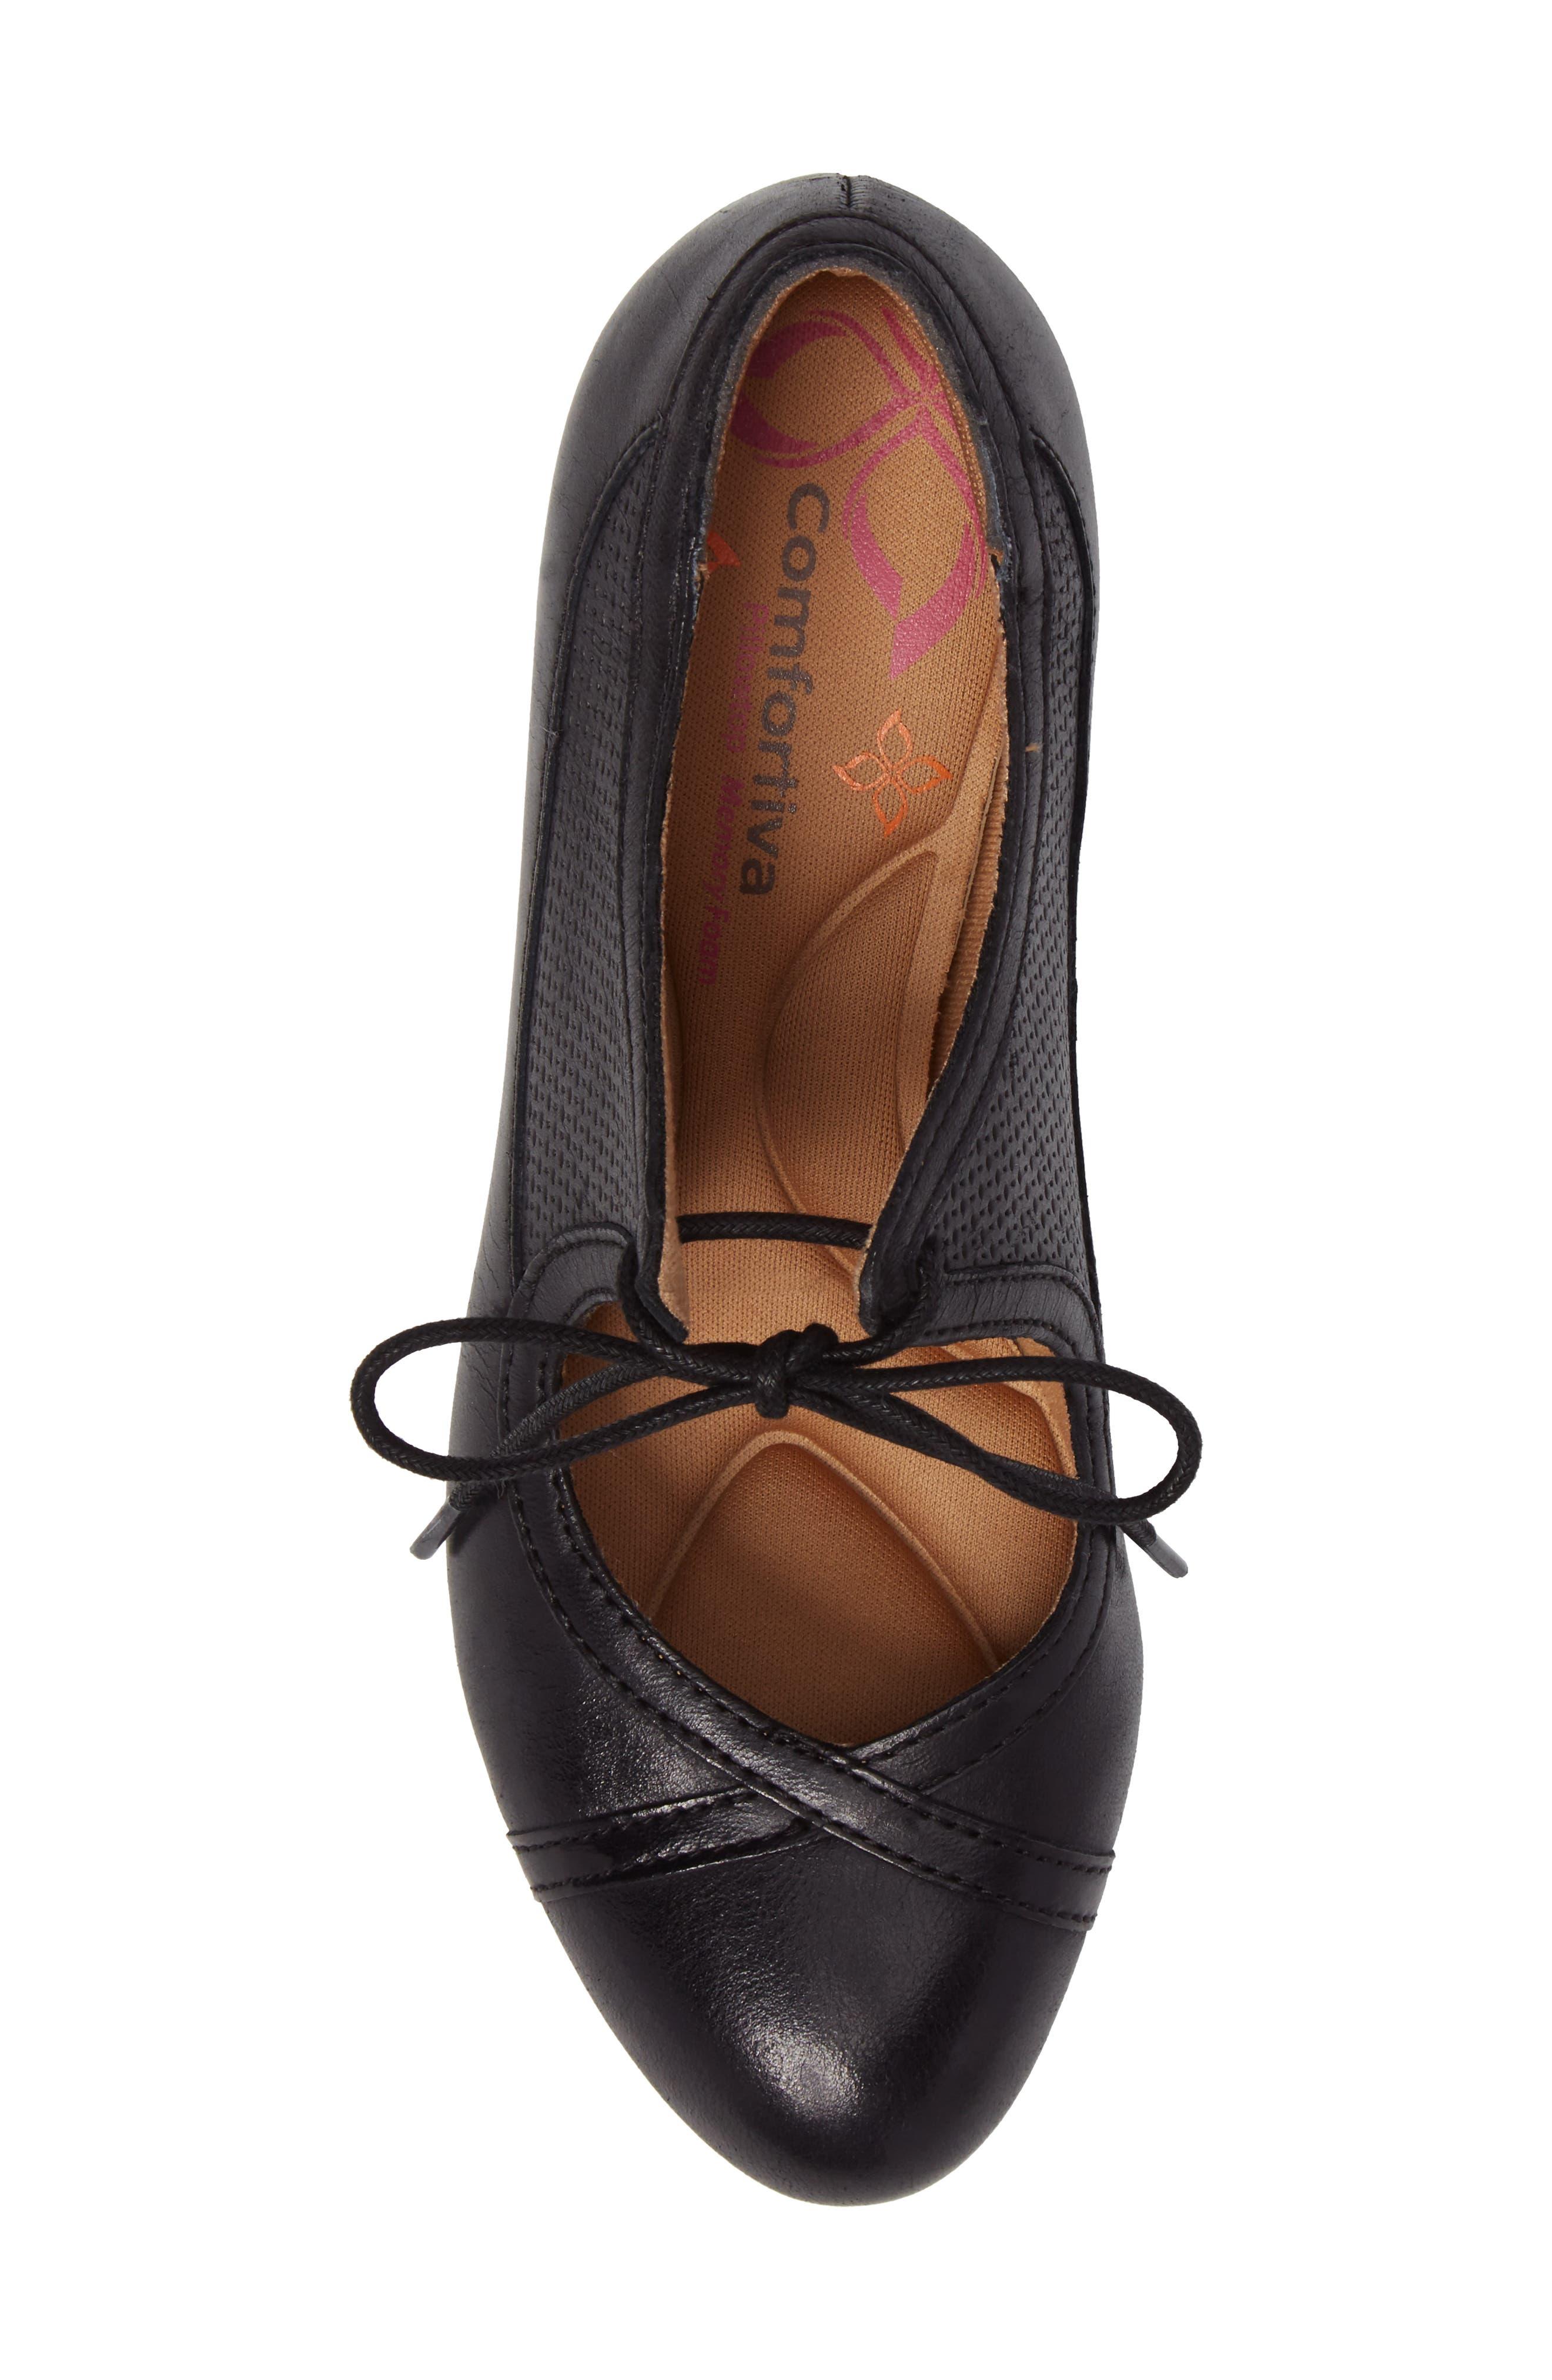 Almyra Pump,                             Alternate thumbnail 5, color,                             Black Leather